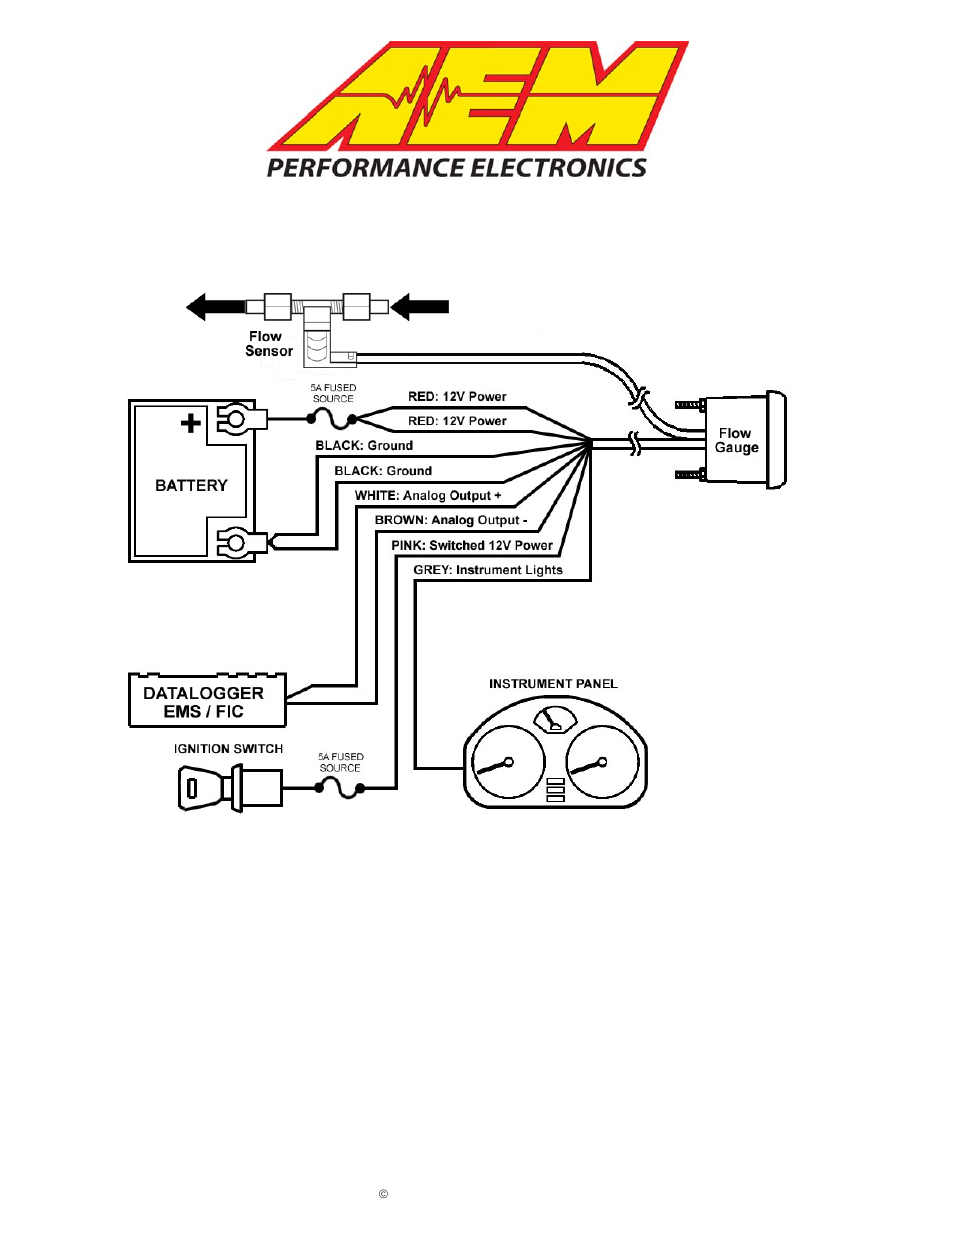 Aem Fic 6 Wiring Diagram Free Download • Oasis-dl.co